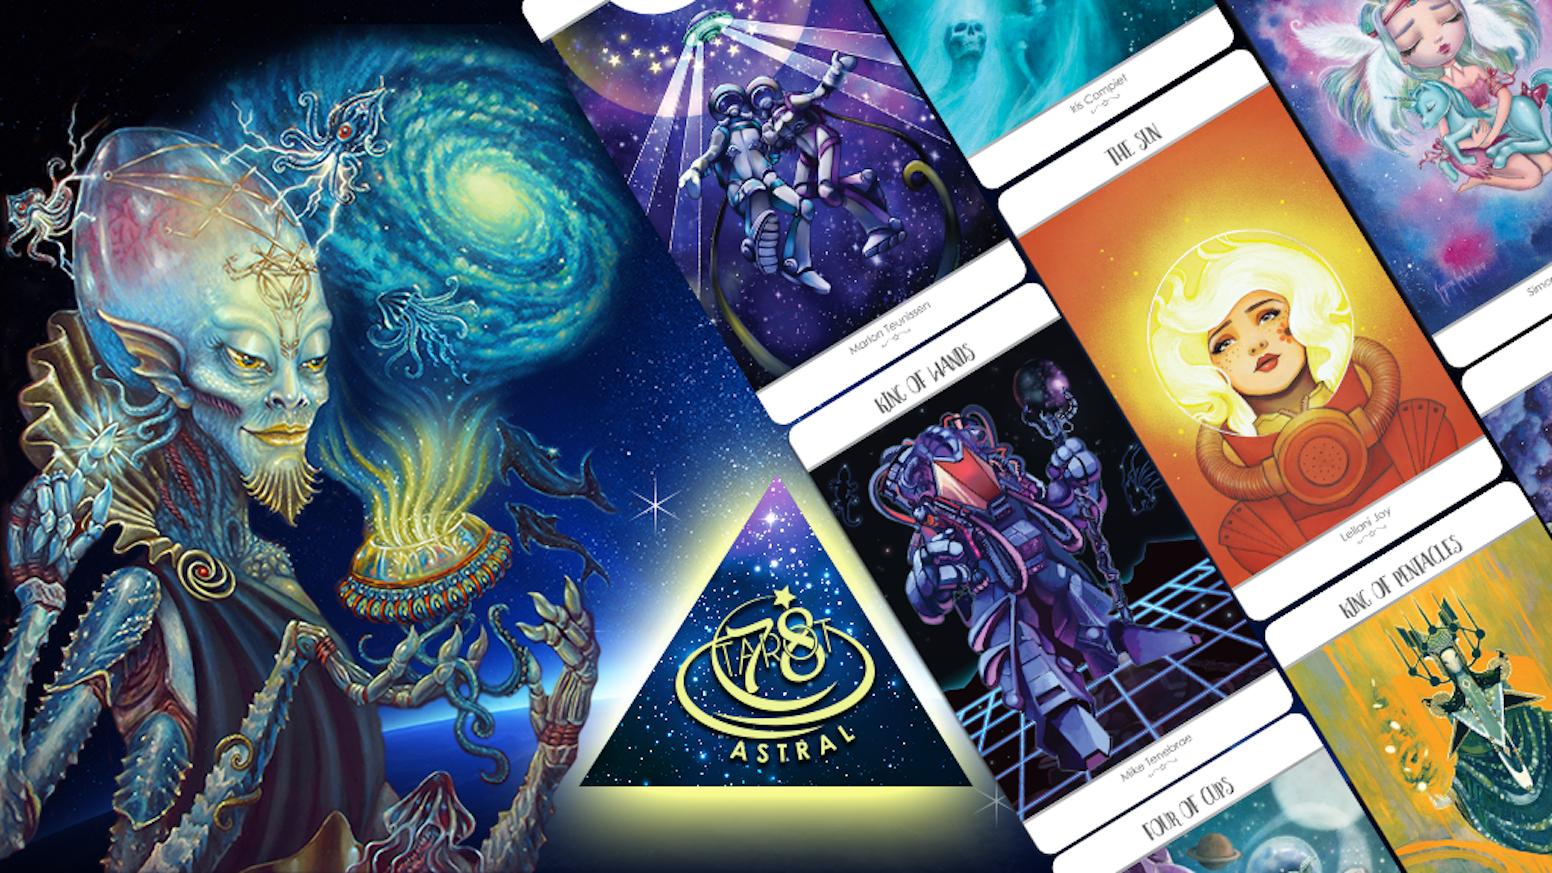 78 Tarot returns to Kickstarter to fund their 4th collaborative Tarot Deck, 78 Tarot Astral - Tarot in Space.